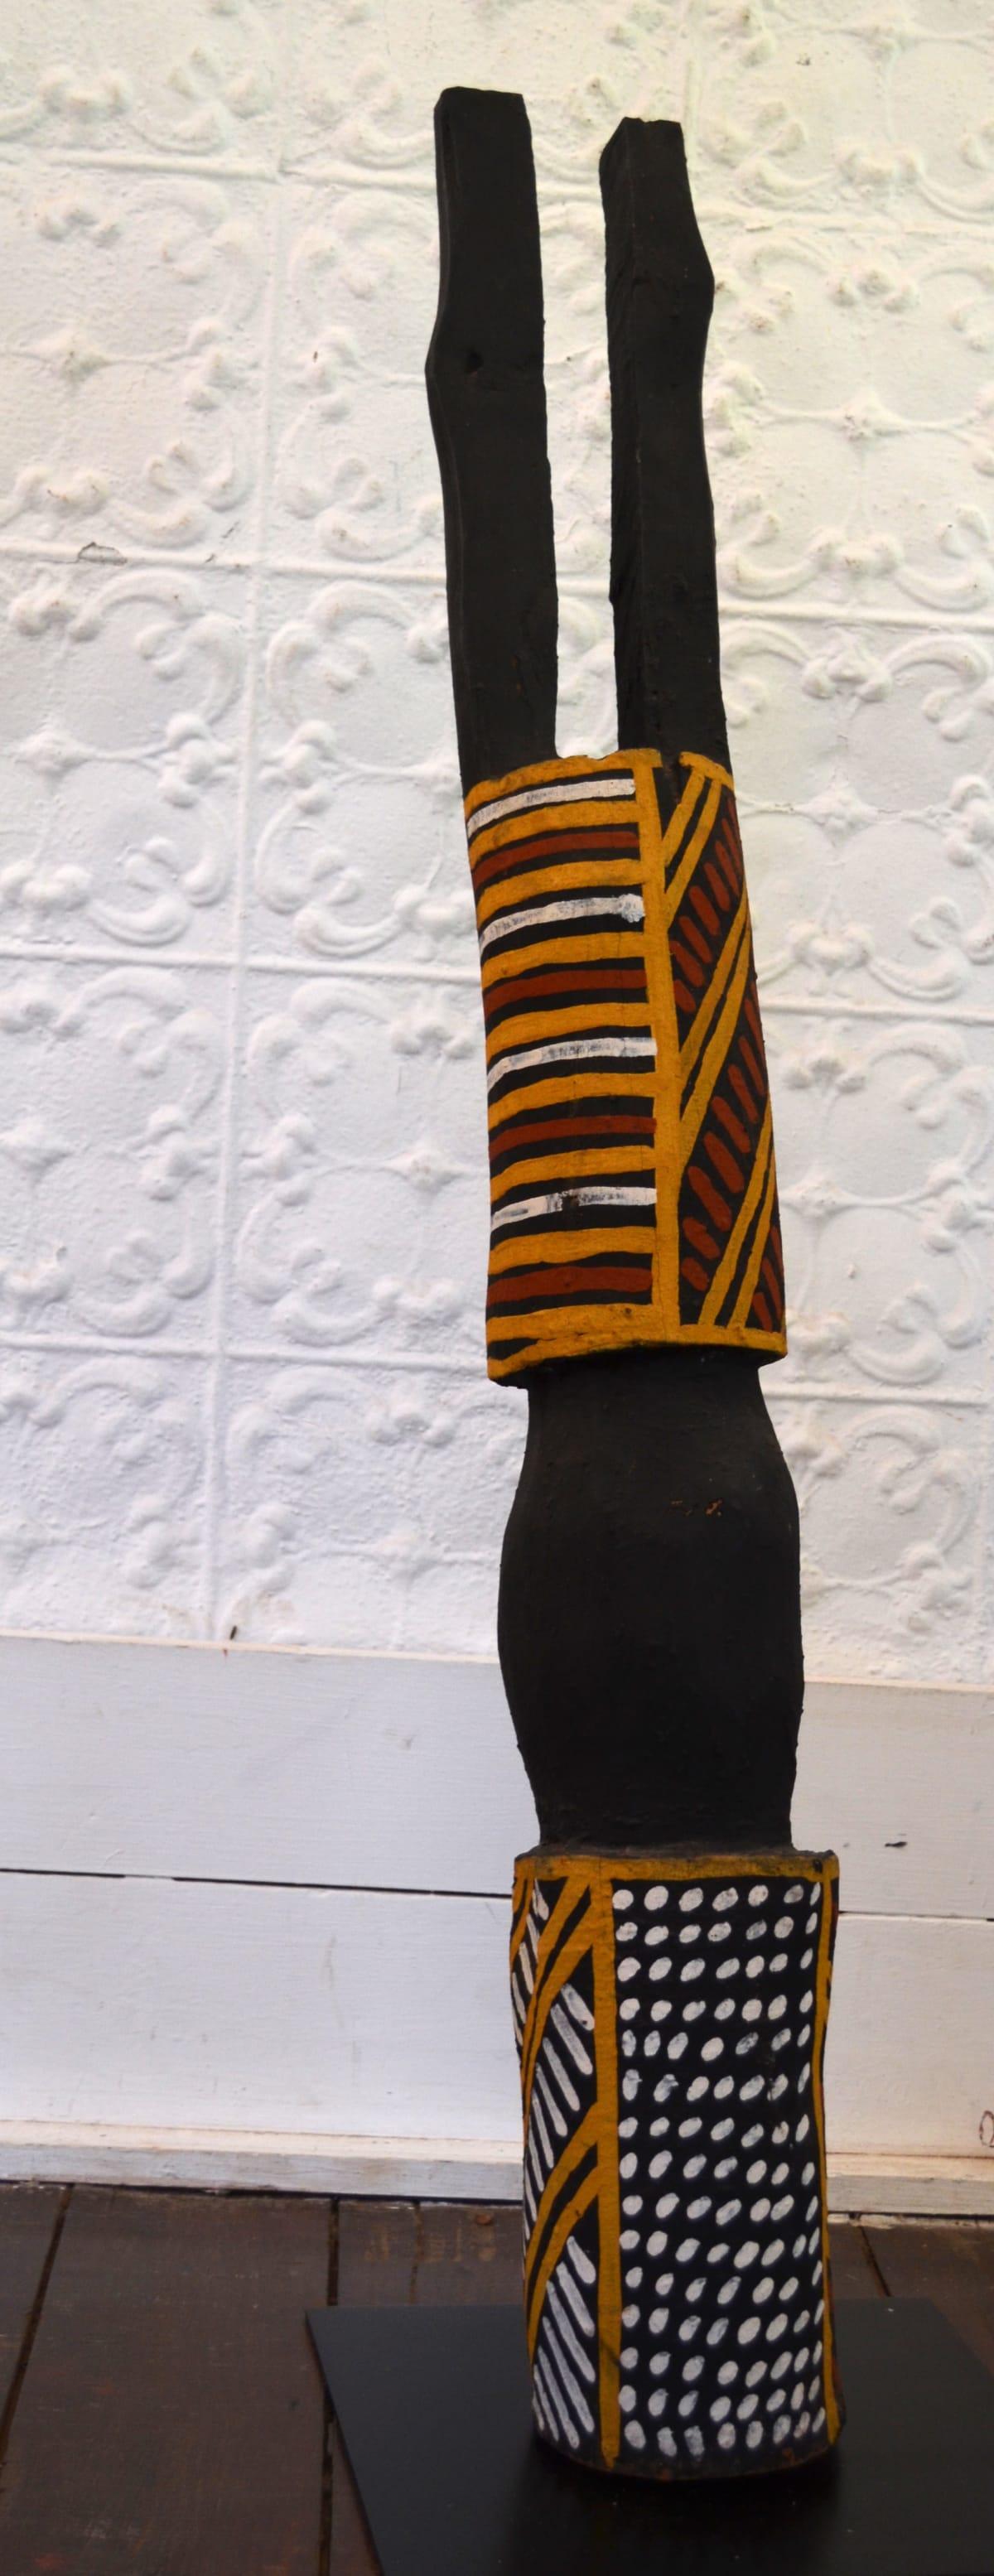 Matthew Freddy Puruntatameri Tutini pukumani Pole carving with natural earth pigment 104 x 14 x 14 cm